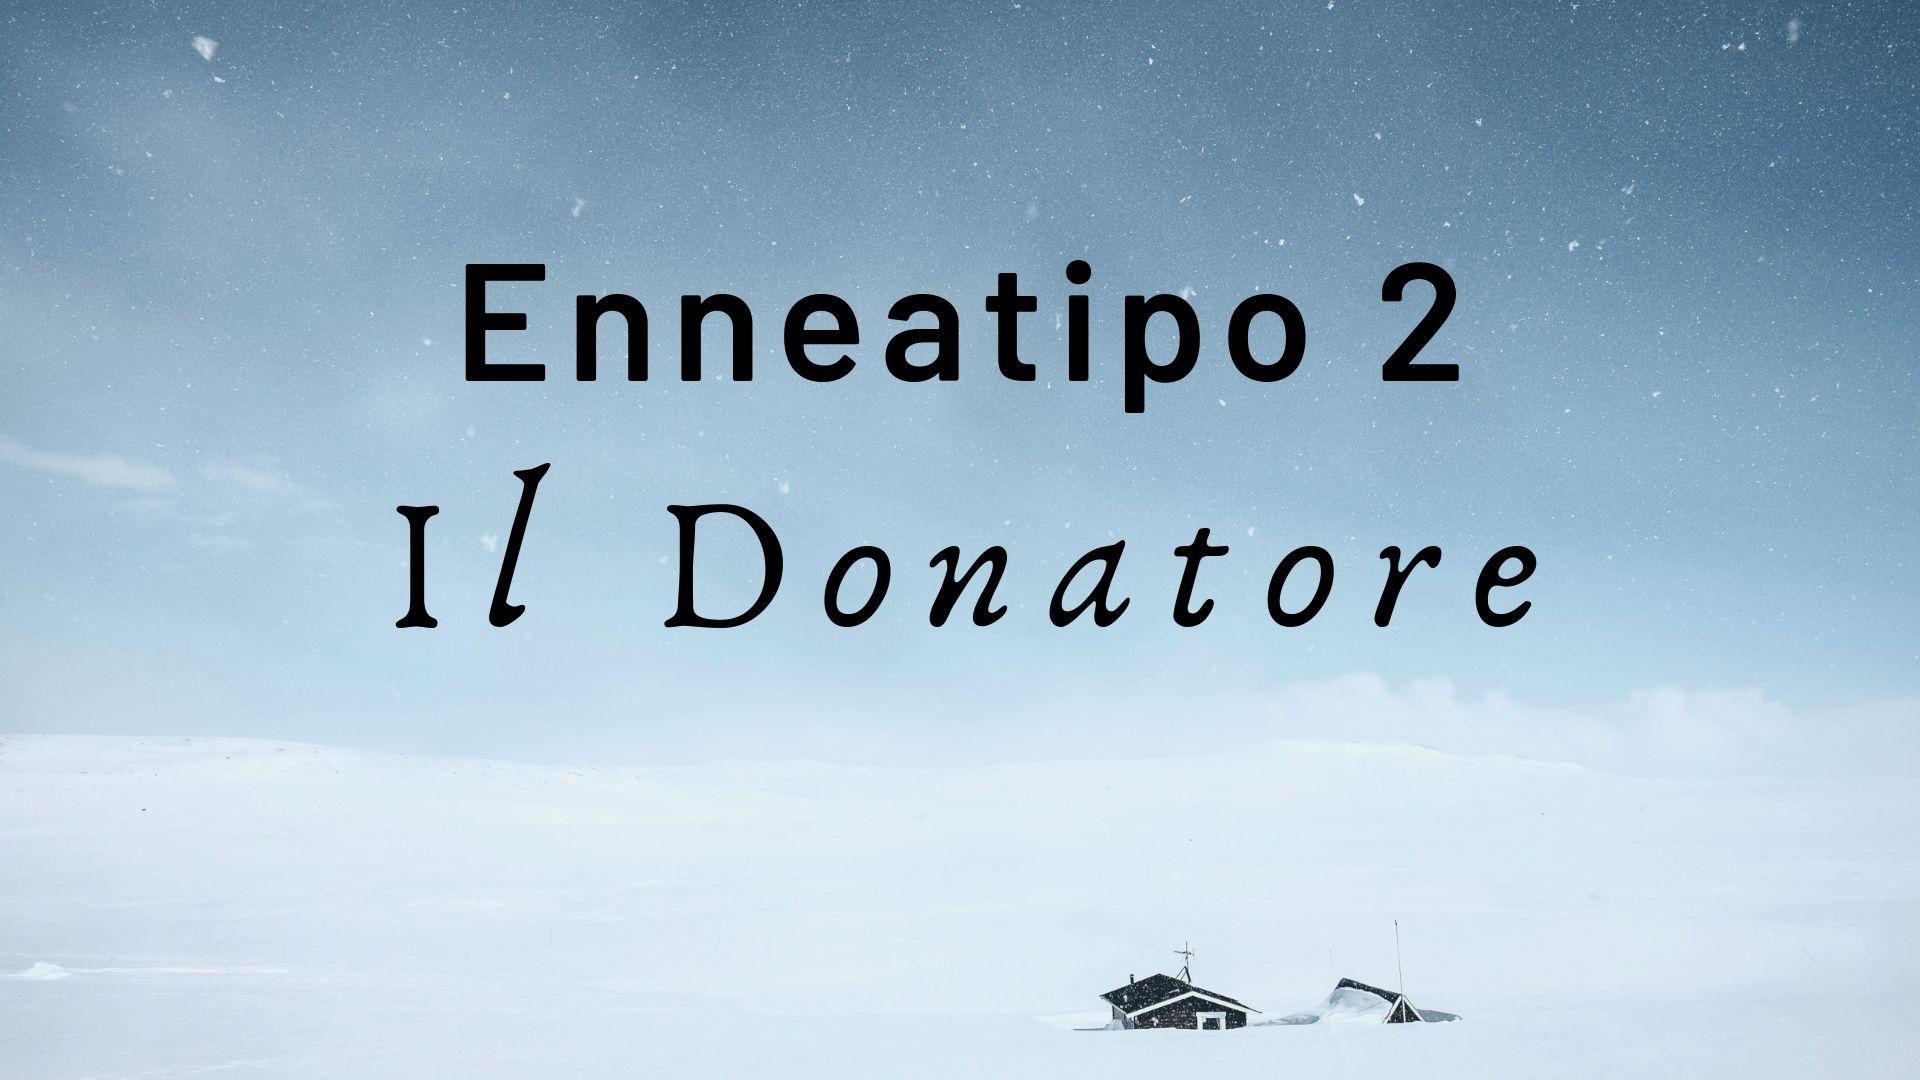 Enneatipo 2